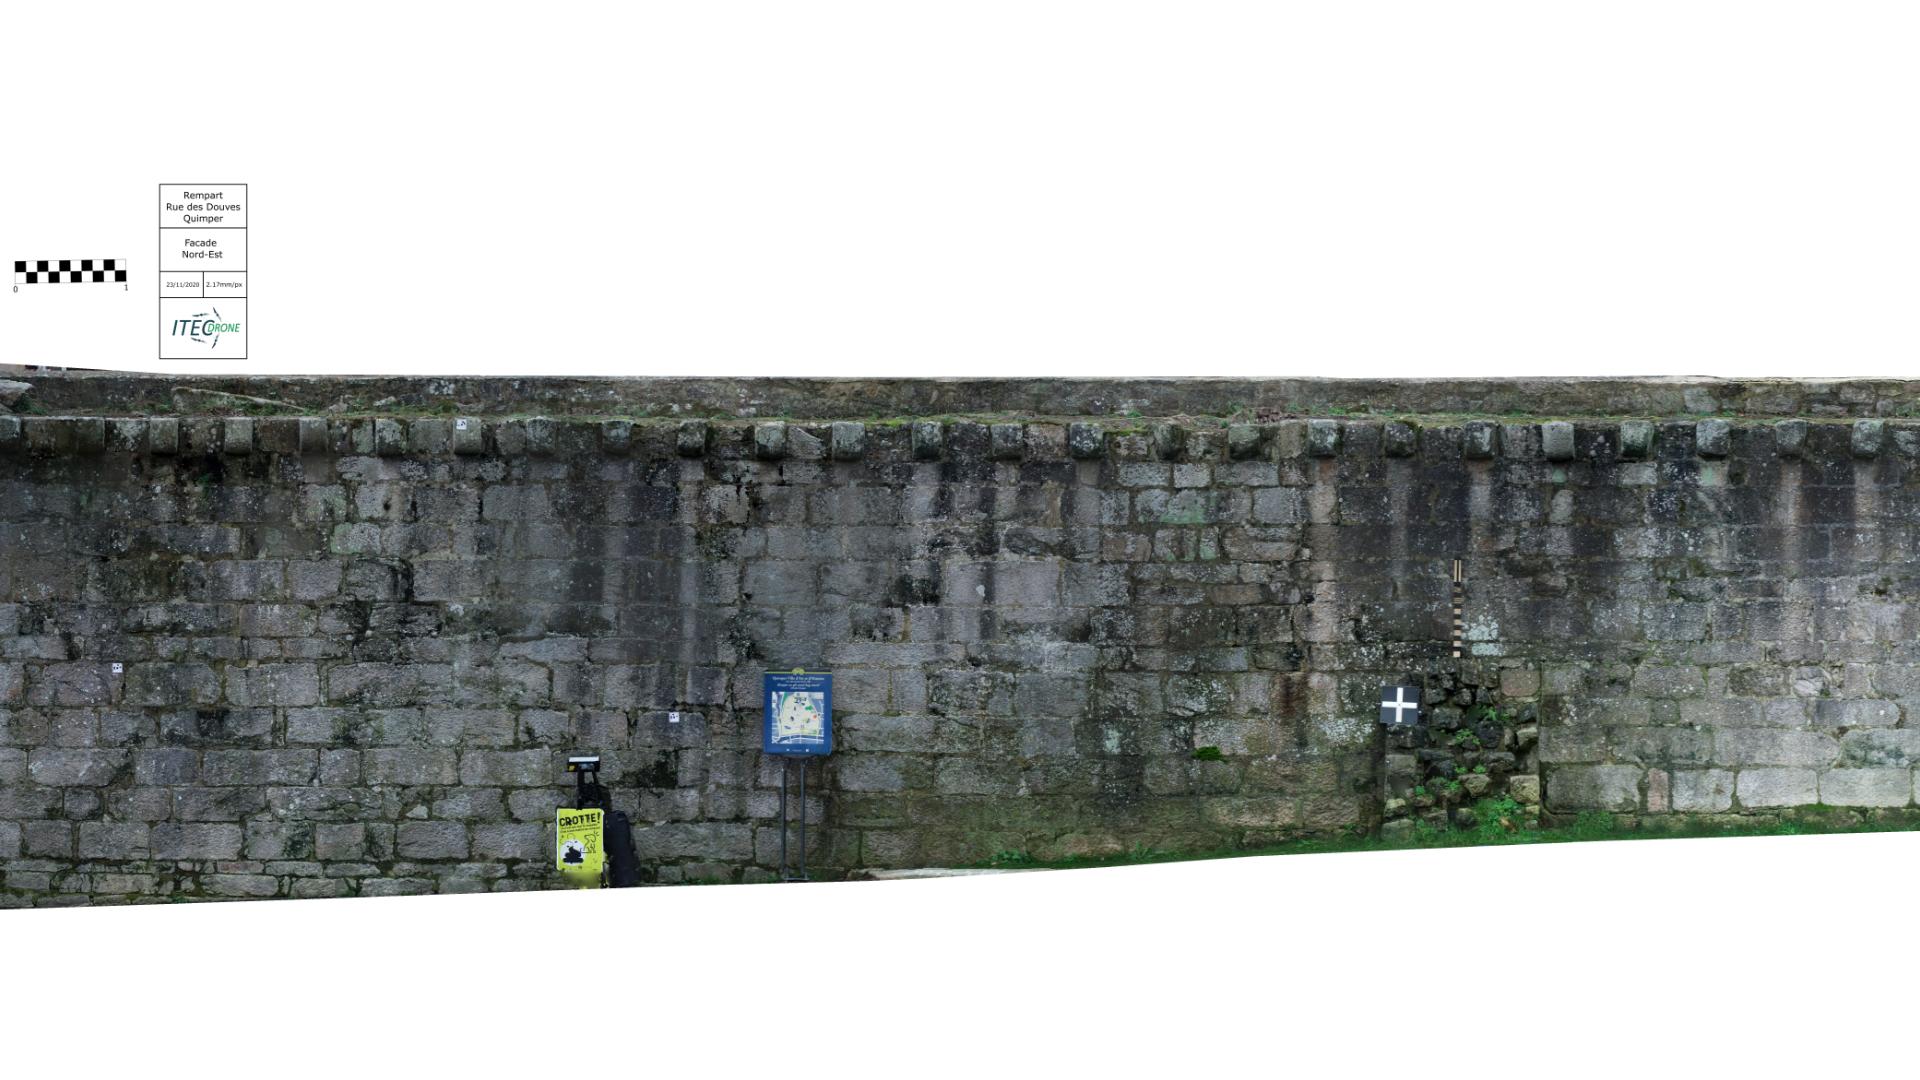 Ortho-façade des remparts